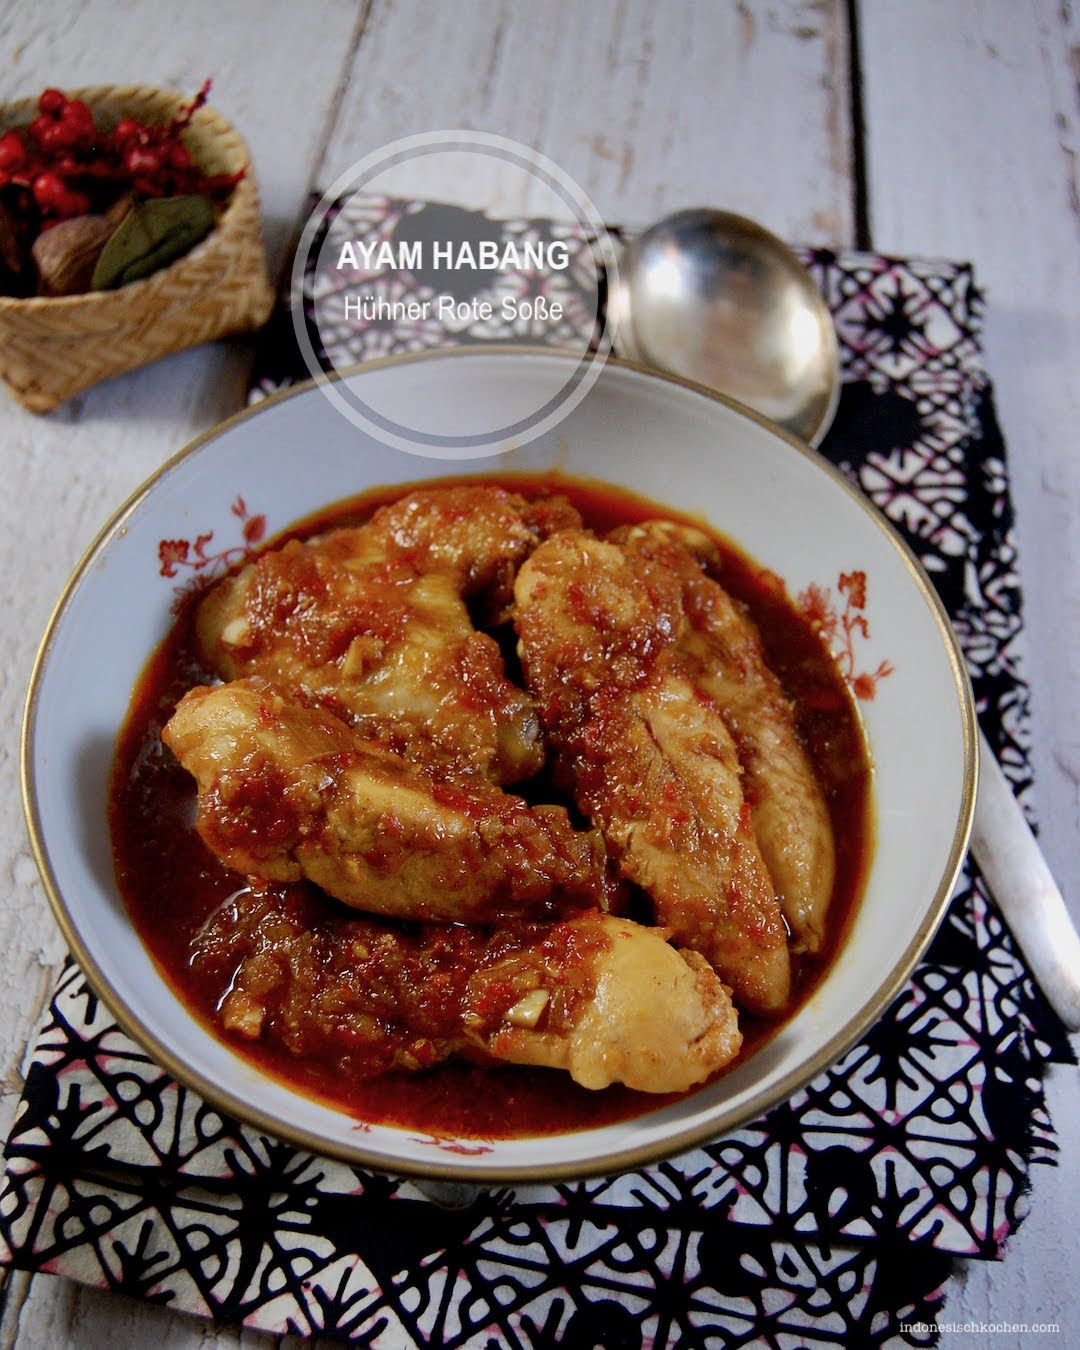 Rezept Hühner Rote Soße Indonesisch Kochen, Nämlich Ayam Habang